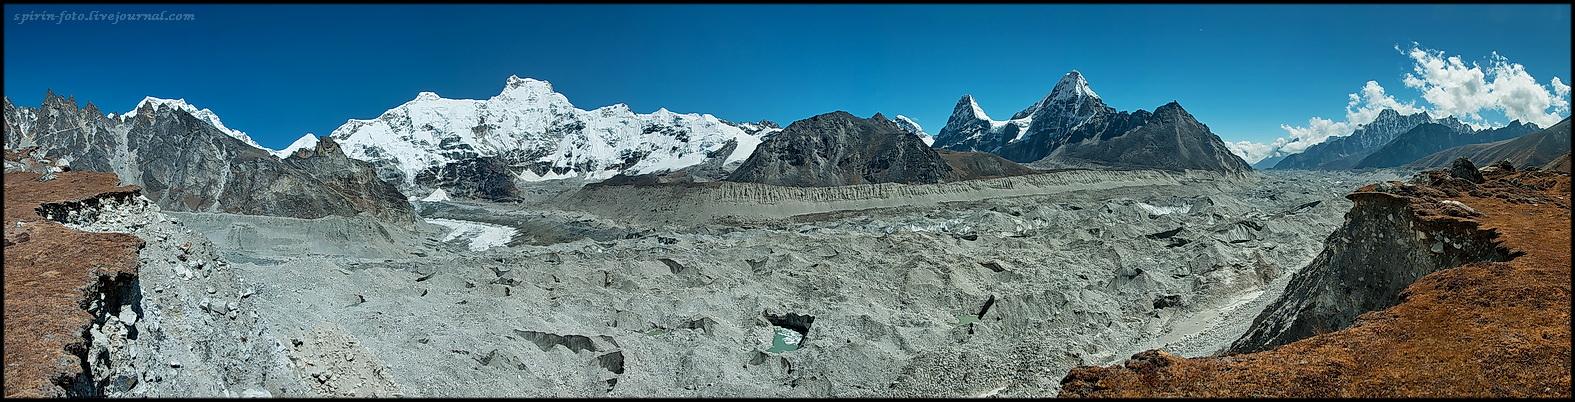 панорама ледник нгозумба 2 сжат 1550